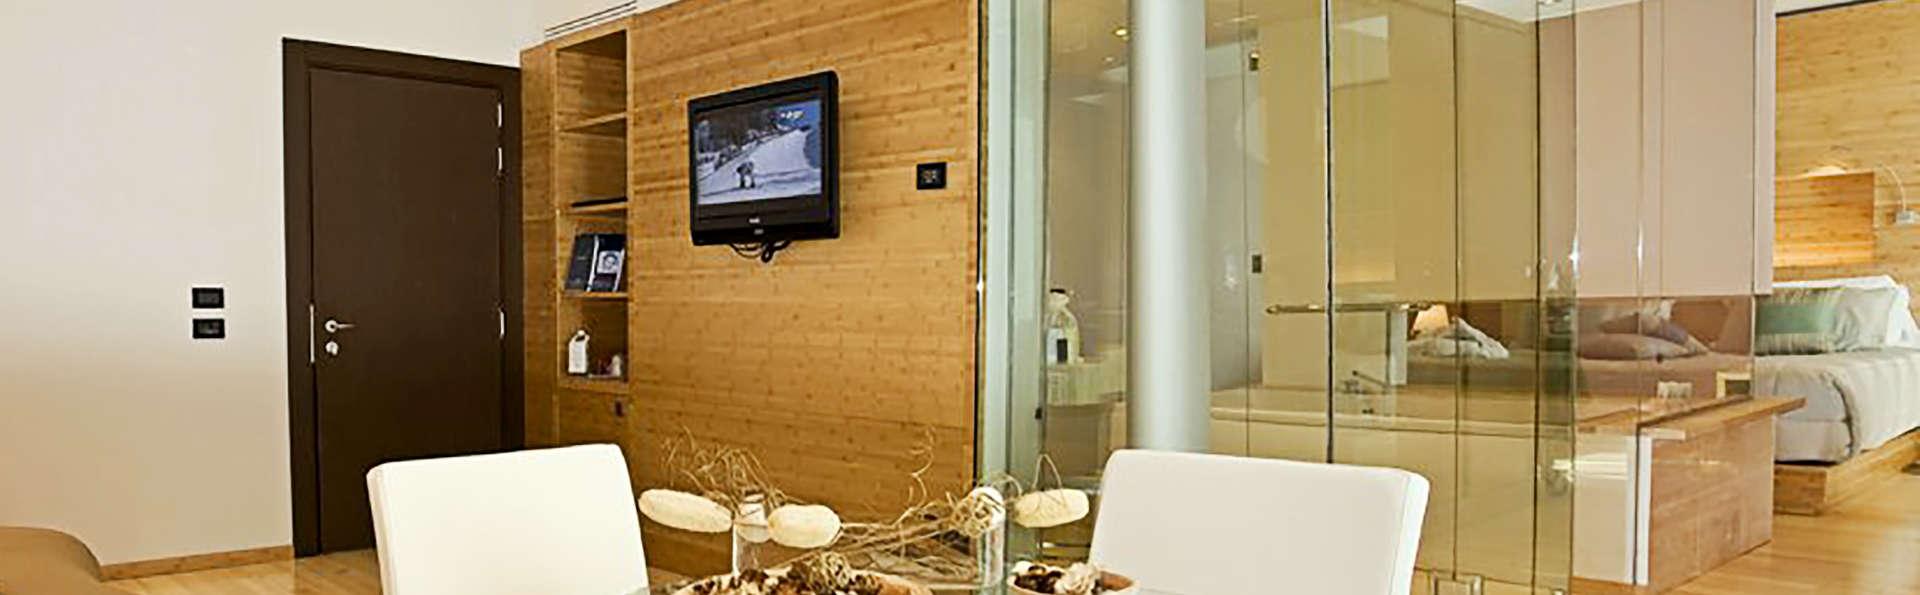 Hotel Diamante - Edit_Room5.jpg